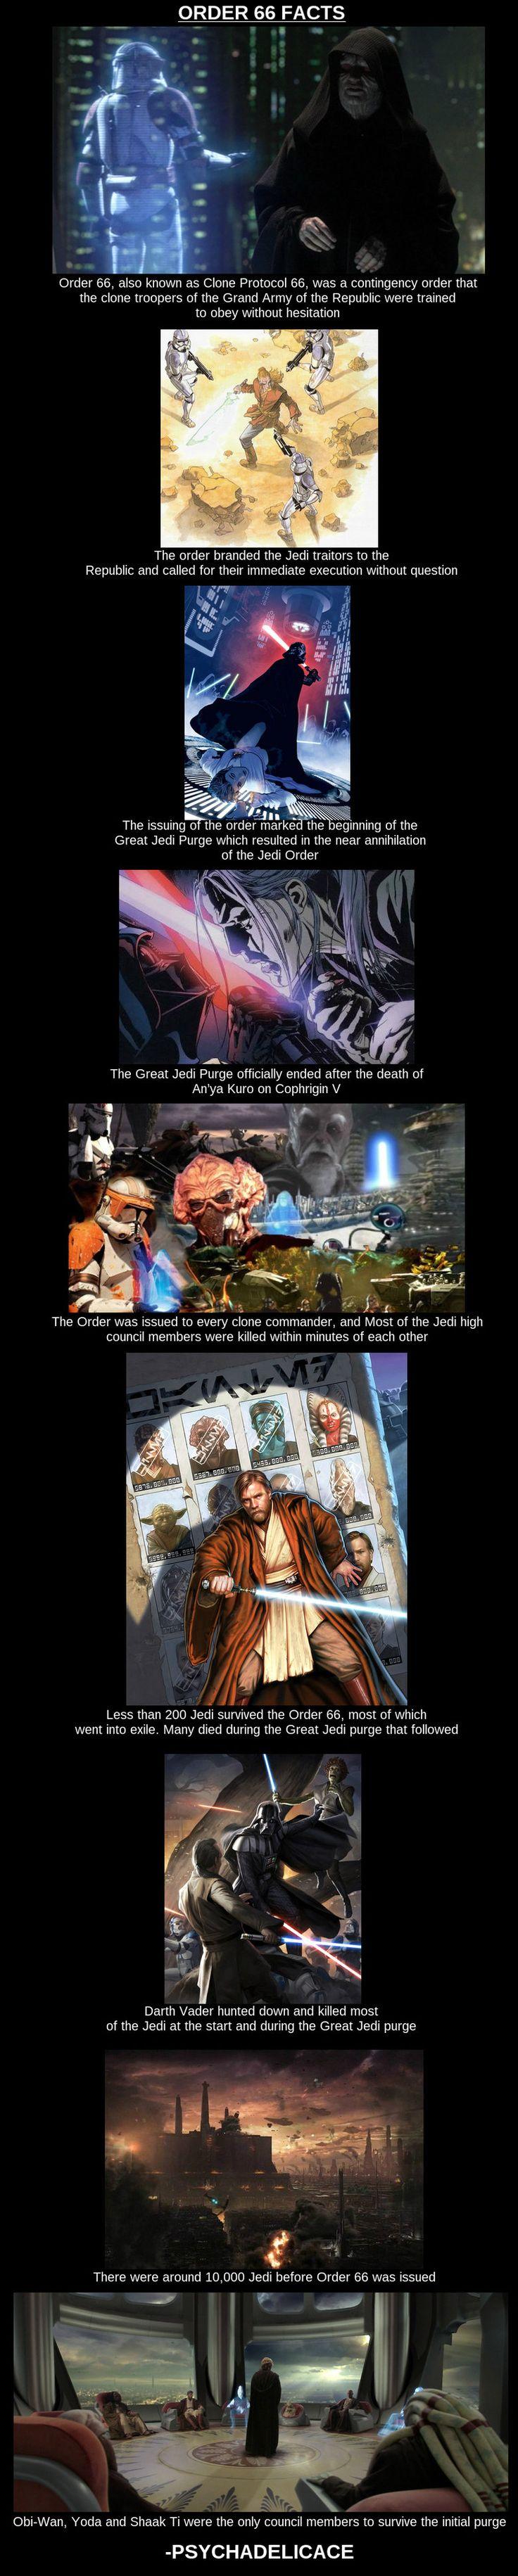 Order 66, Star Wars trivia